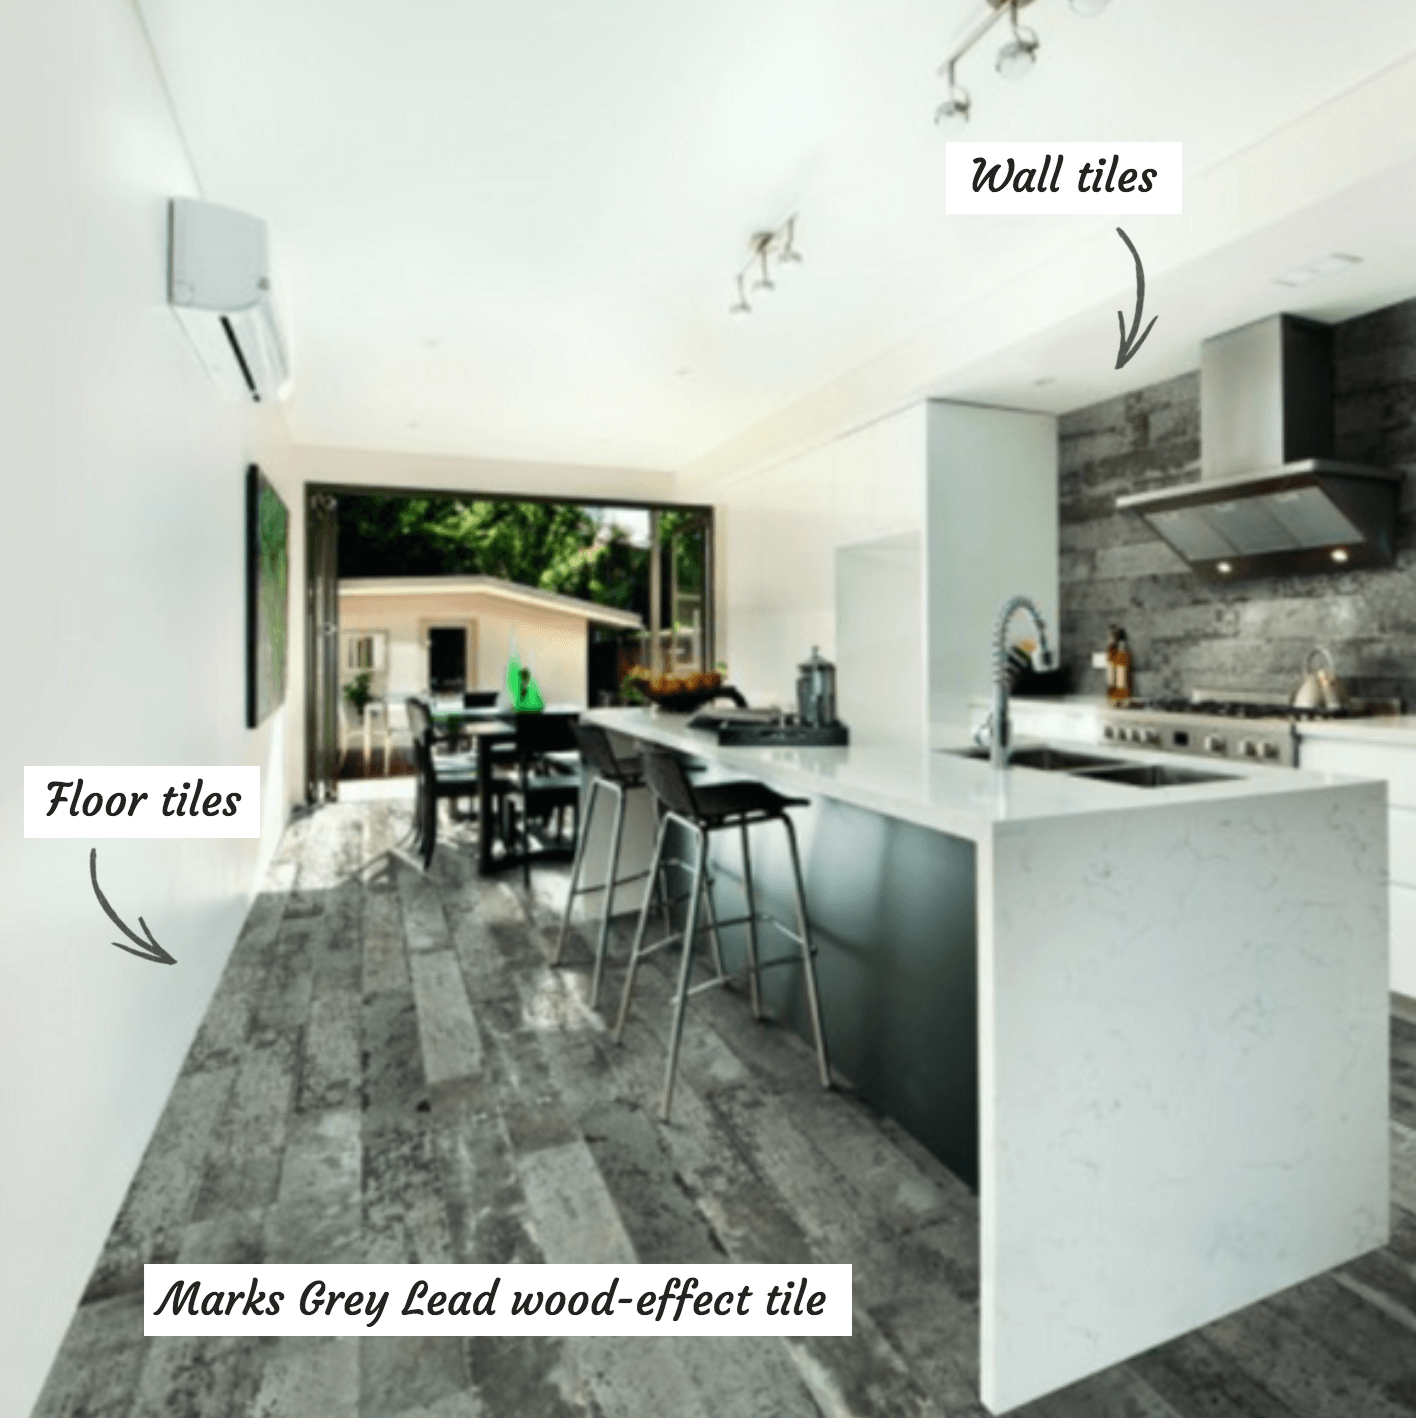 Marks Grey Lead wood-effect tiles